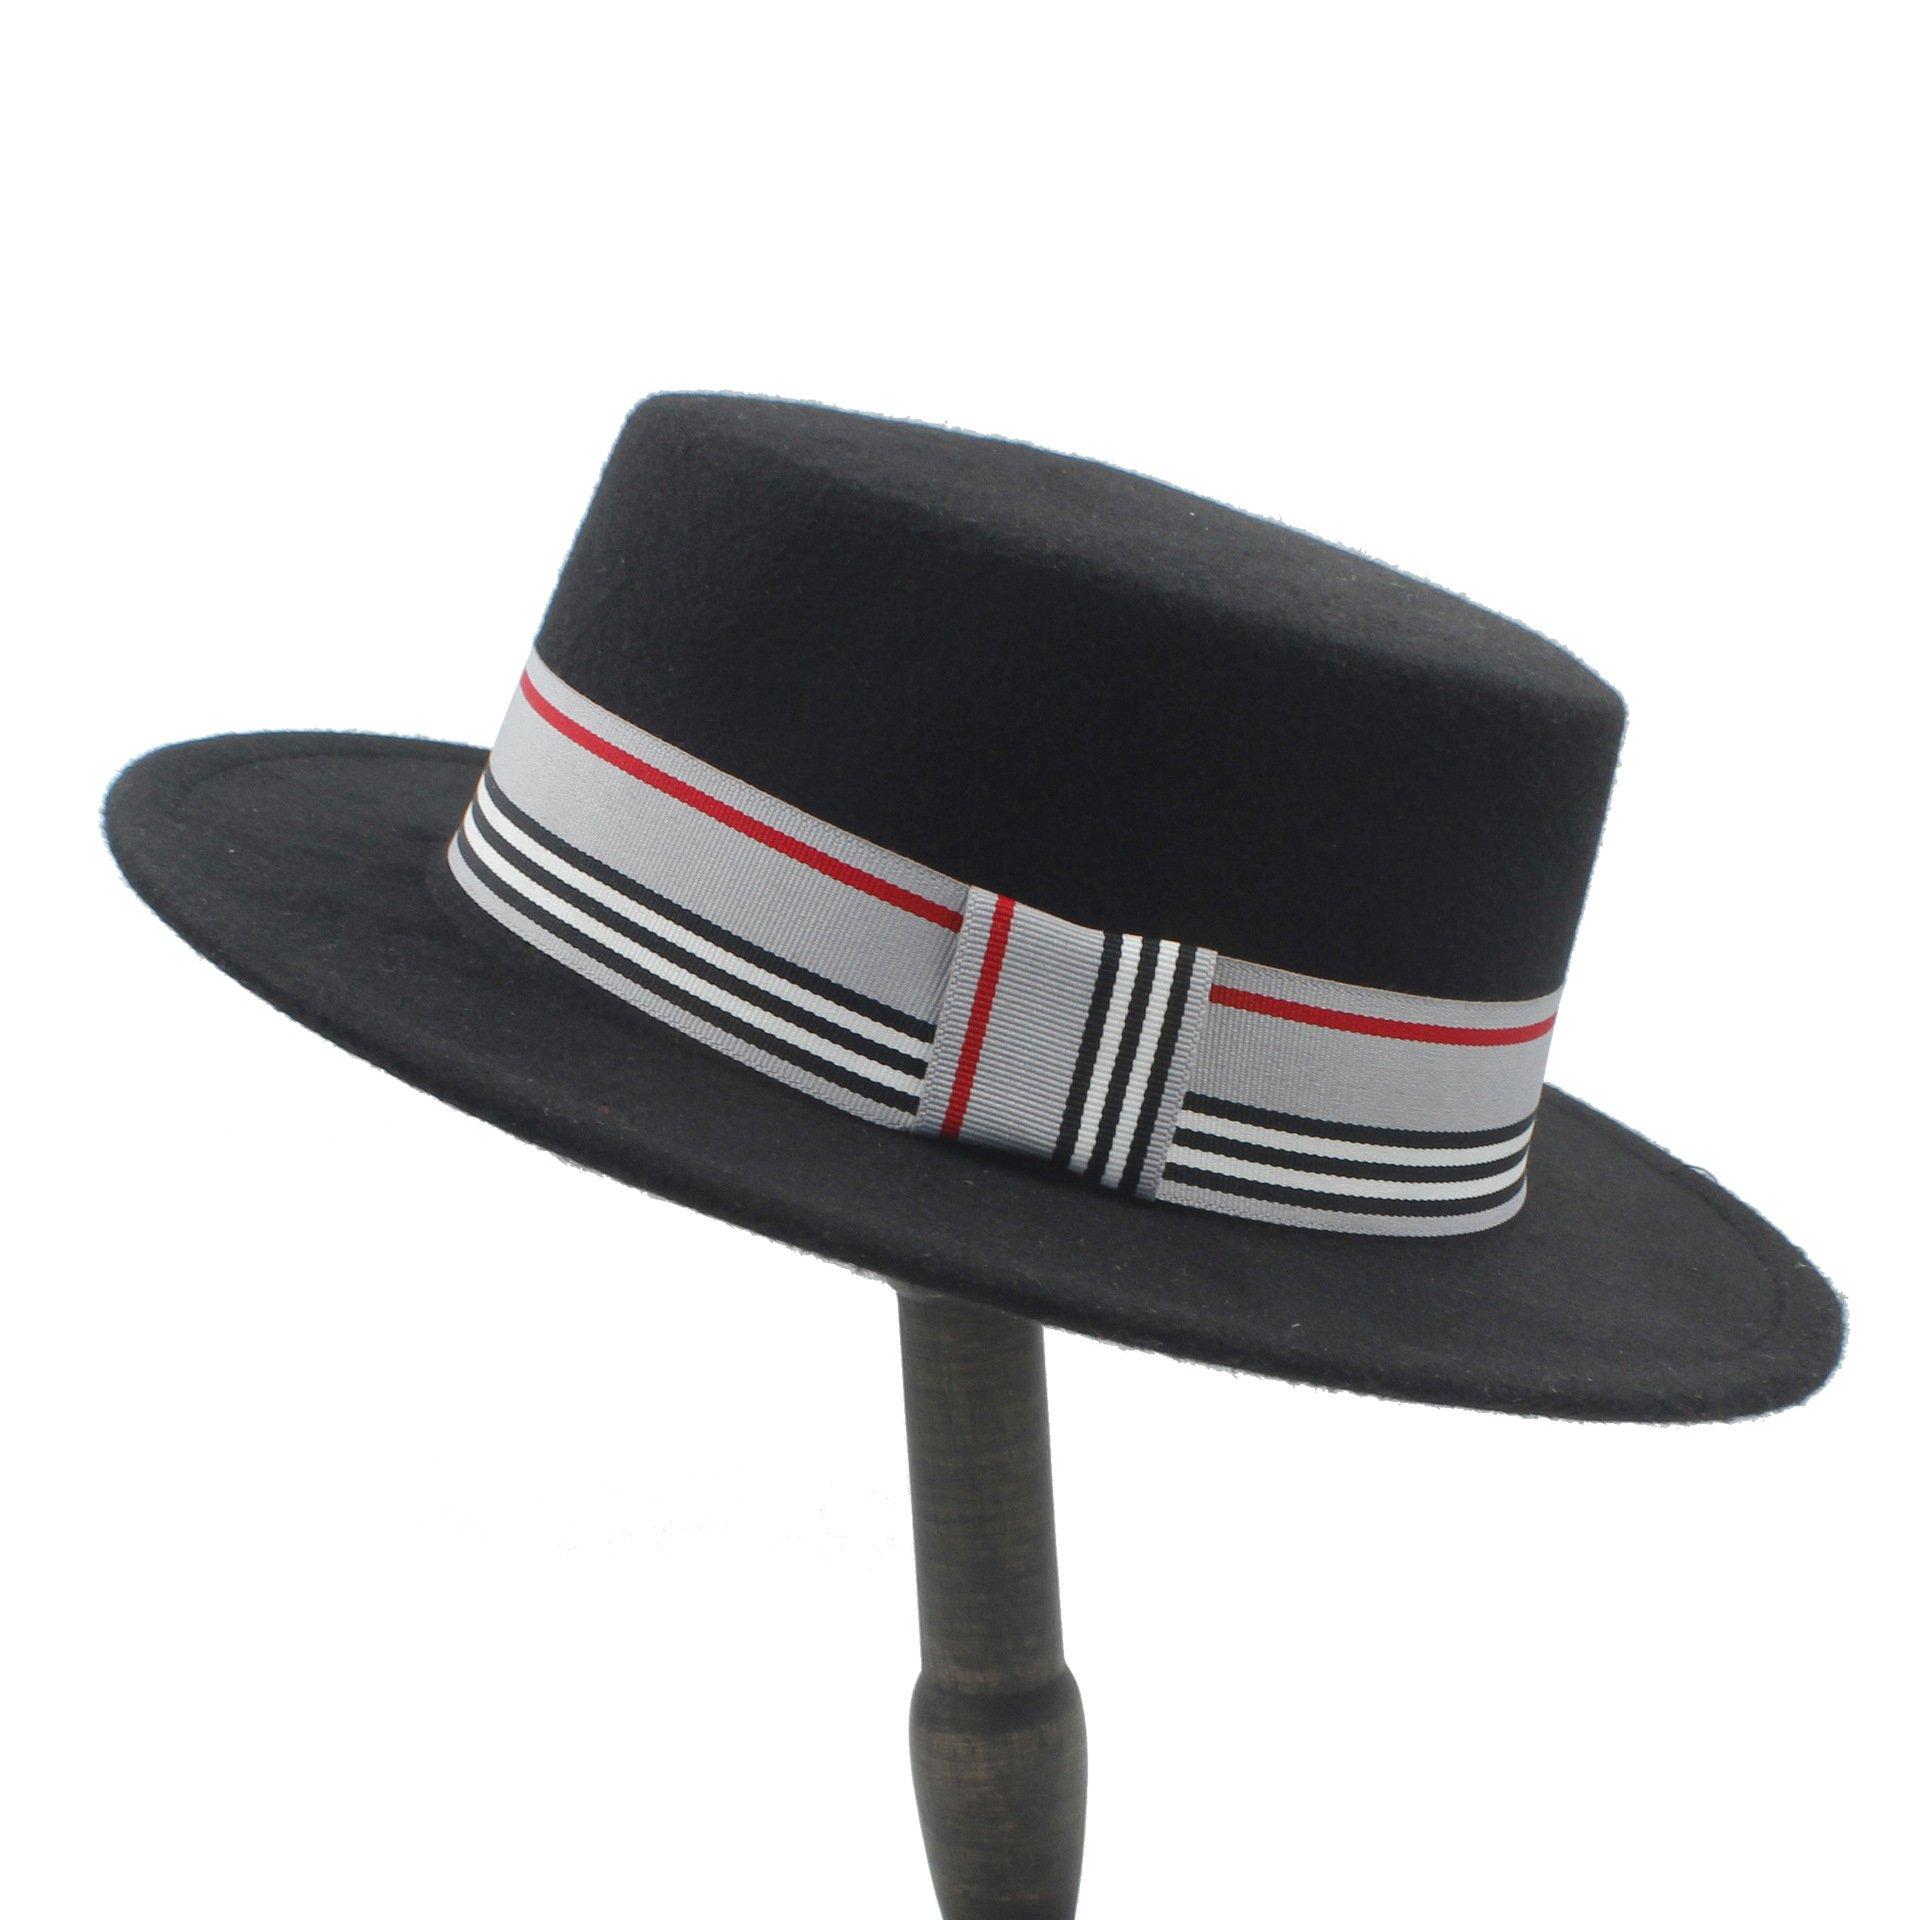 Fashion Wool Flat Top Hat For Women's Felt Wide Brim Fedora Hat Laday Prok Pie Chapeu de Feltro Bowler Gambler Top Hat